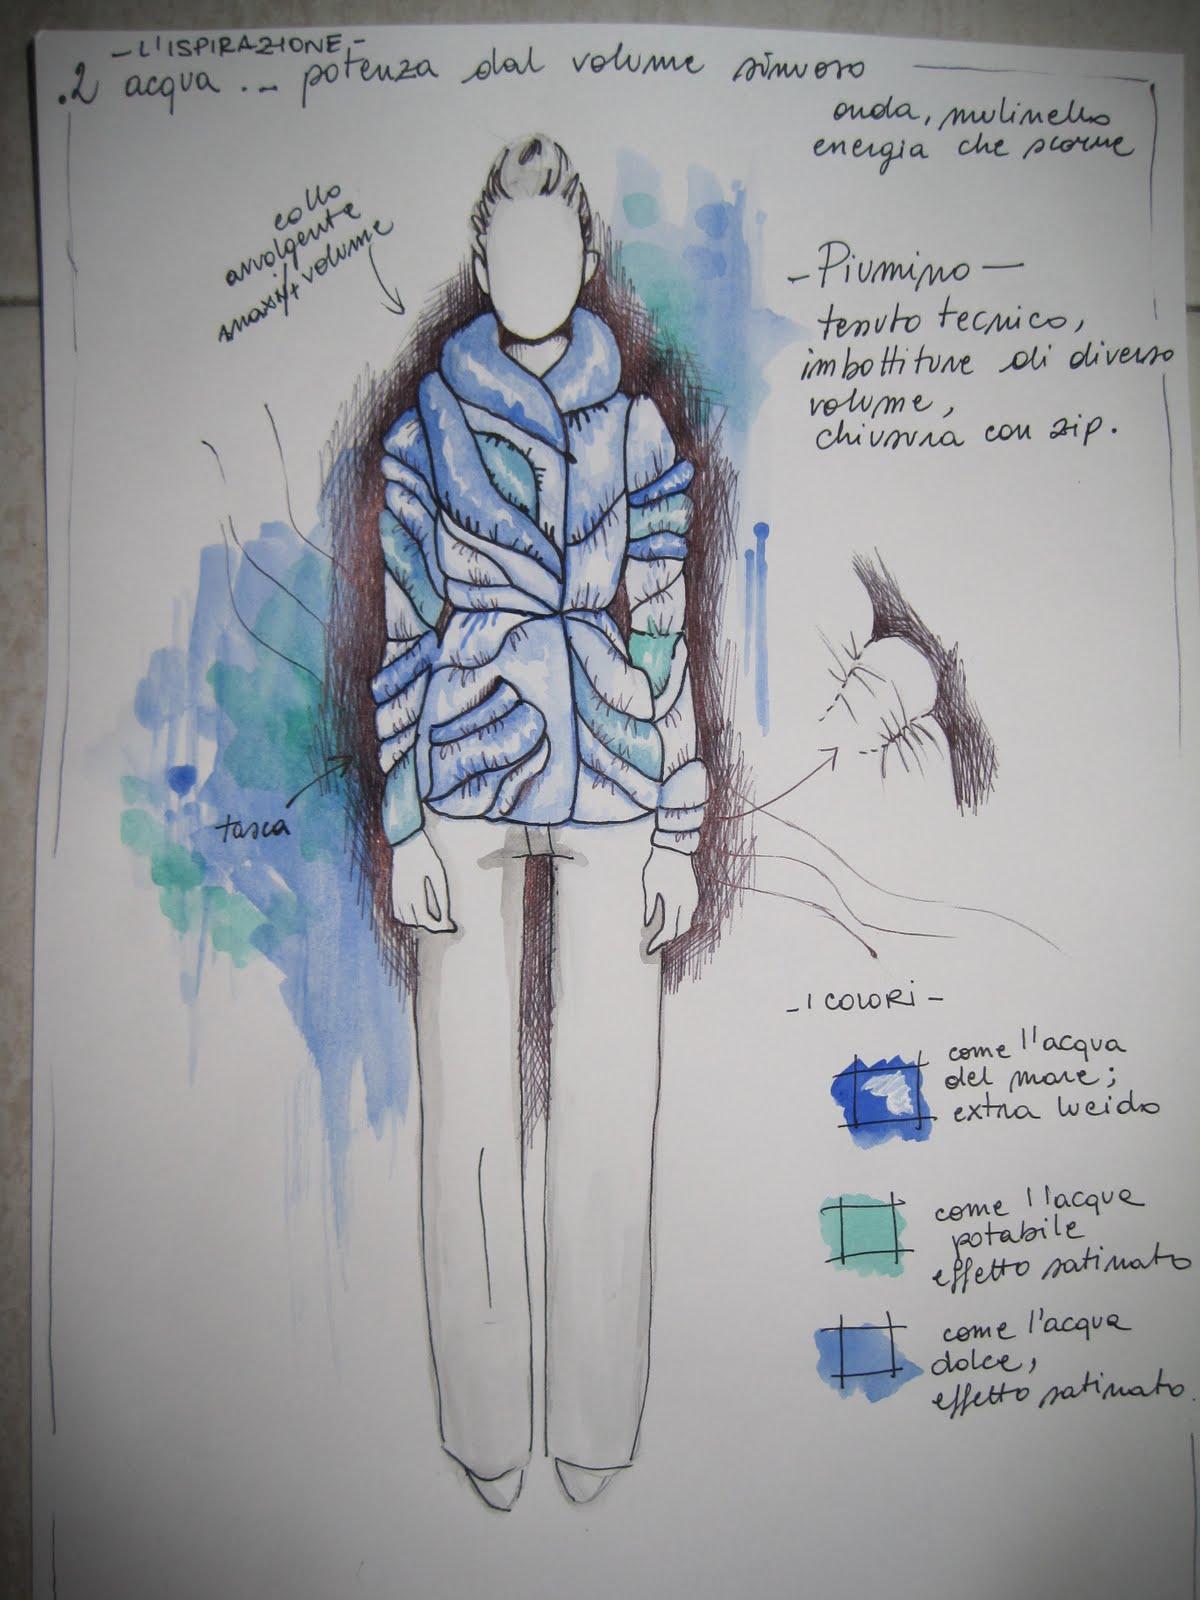 http://4.bp.blogspot.com/_z4Q9HpTzYfQ/TJSTGvr_f4I/AAAAAAAAAyI/Hspmt8WwI1k/s1600/concorso+006.jpg